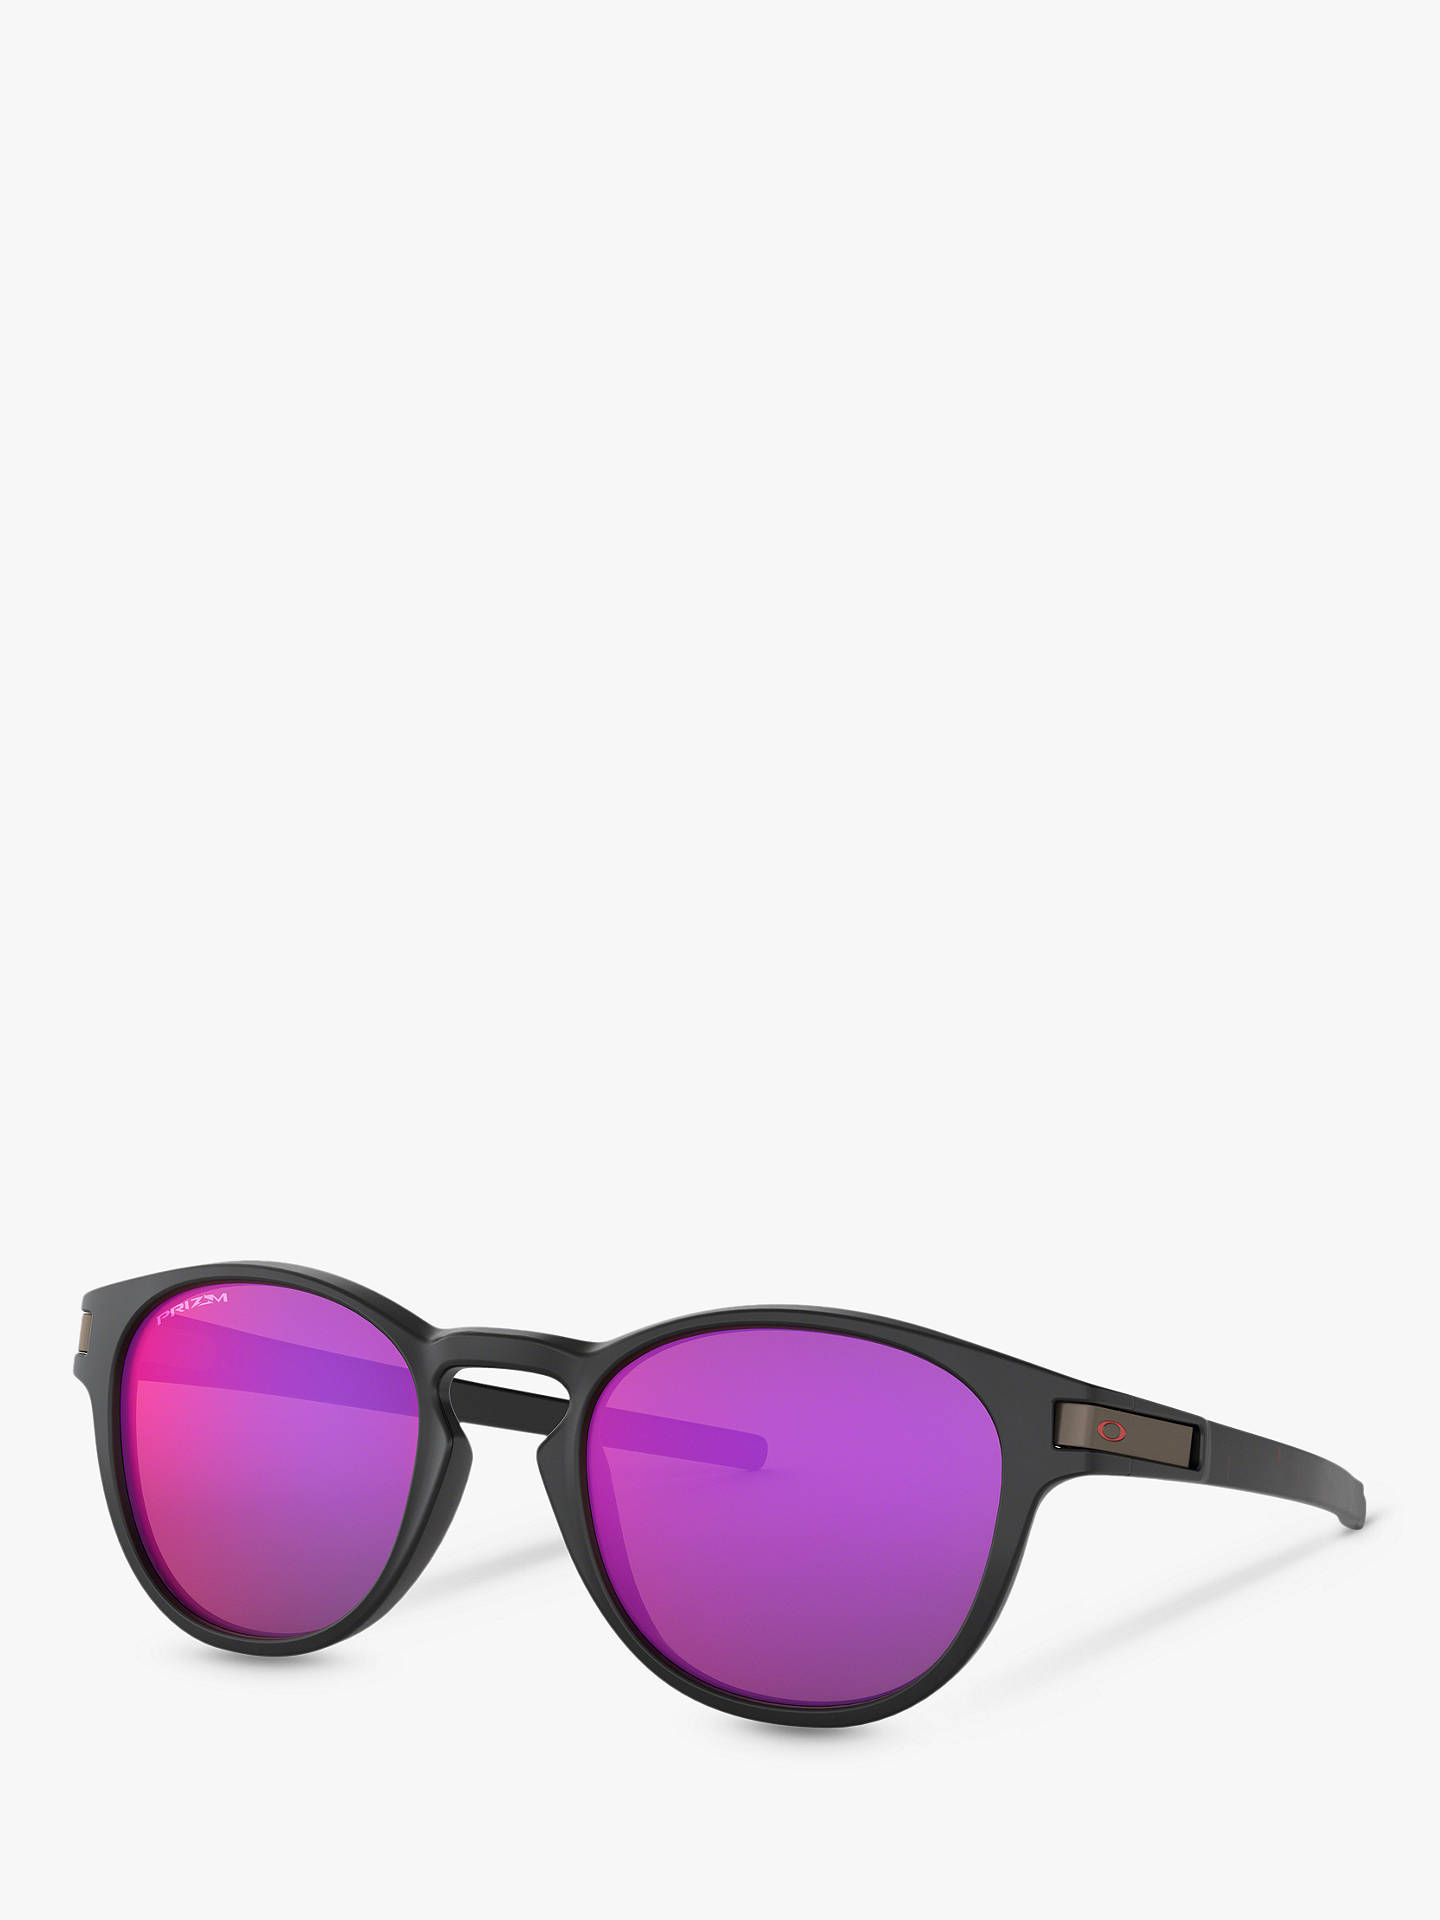 Oakley OO9265 Men's Latch Prizm Round Sunglasses, Matte Black/Purple